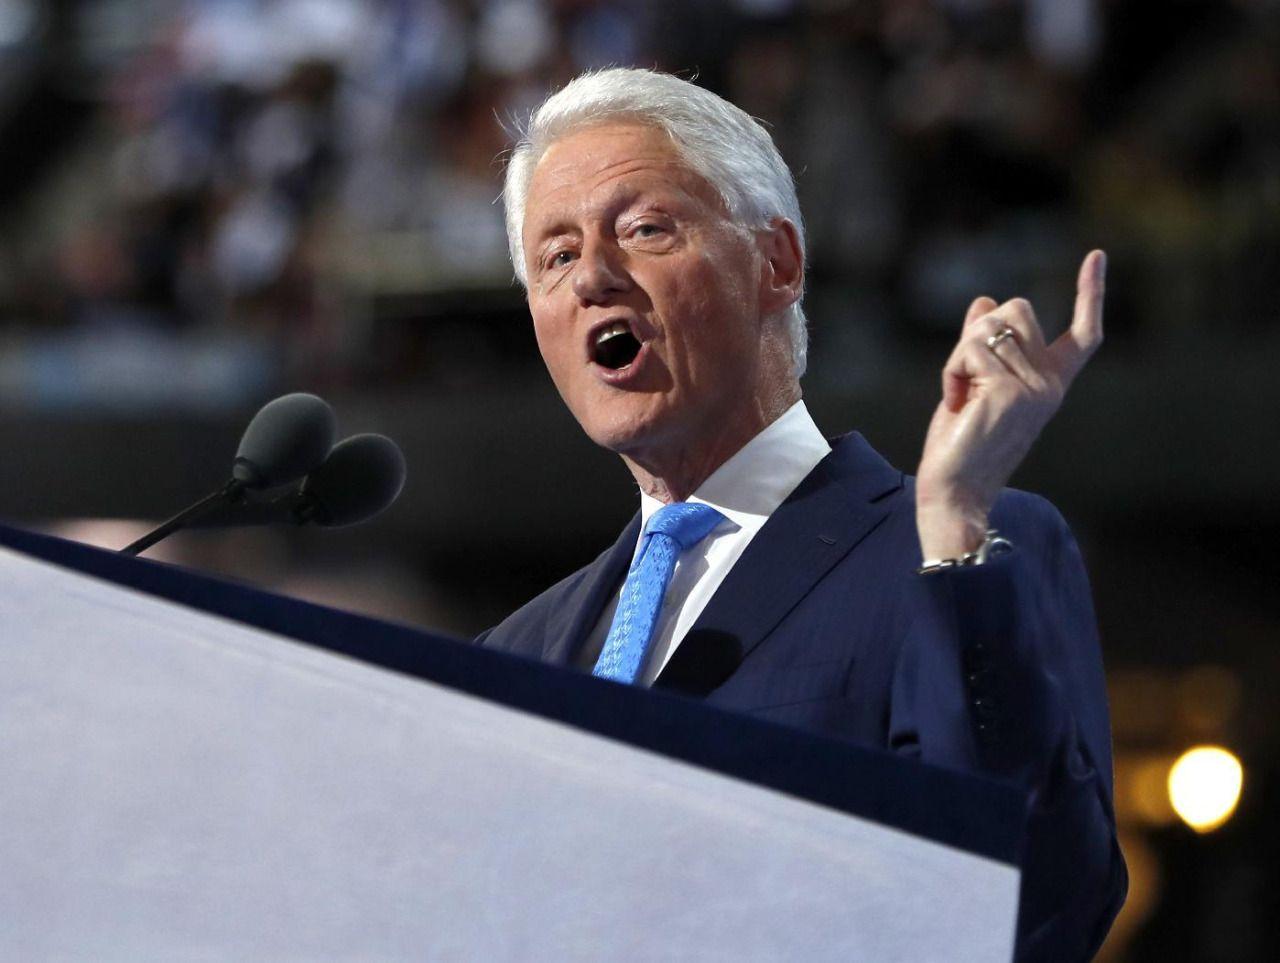 bill-clinton-speech.jpg